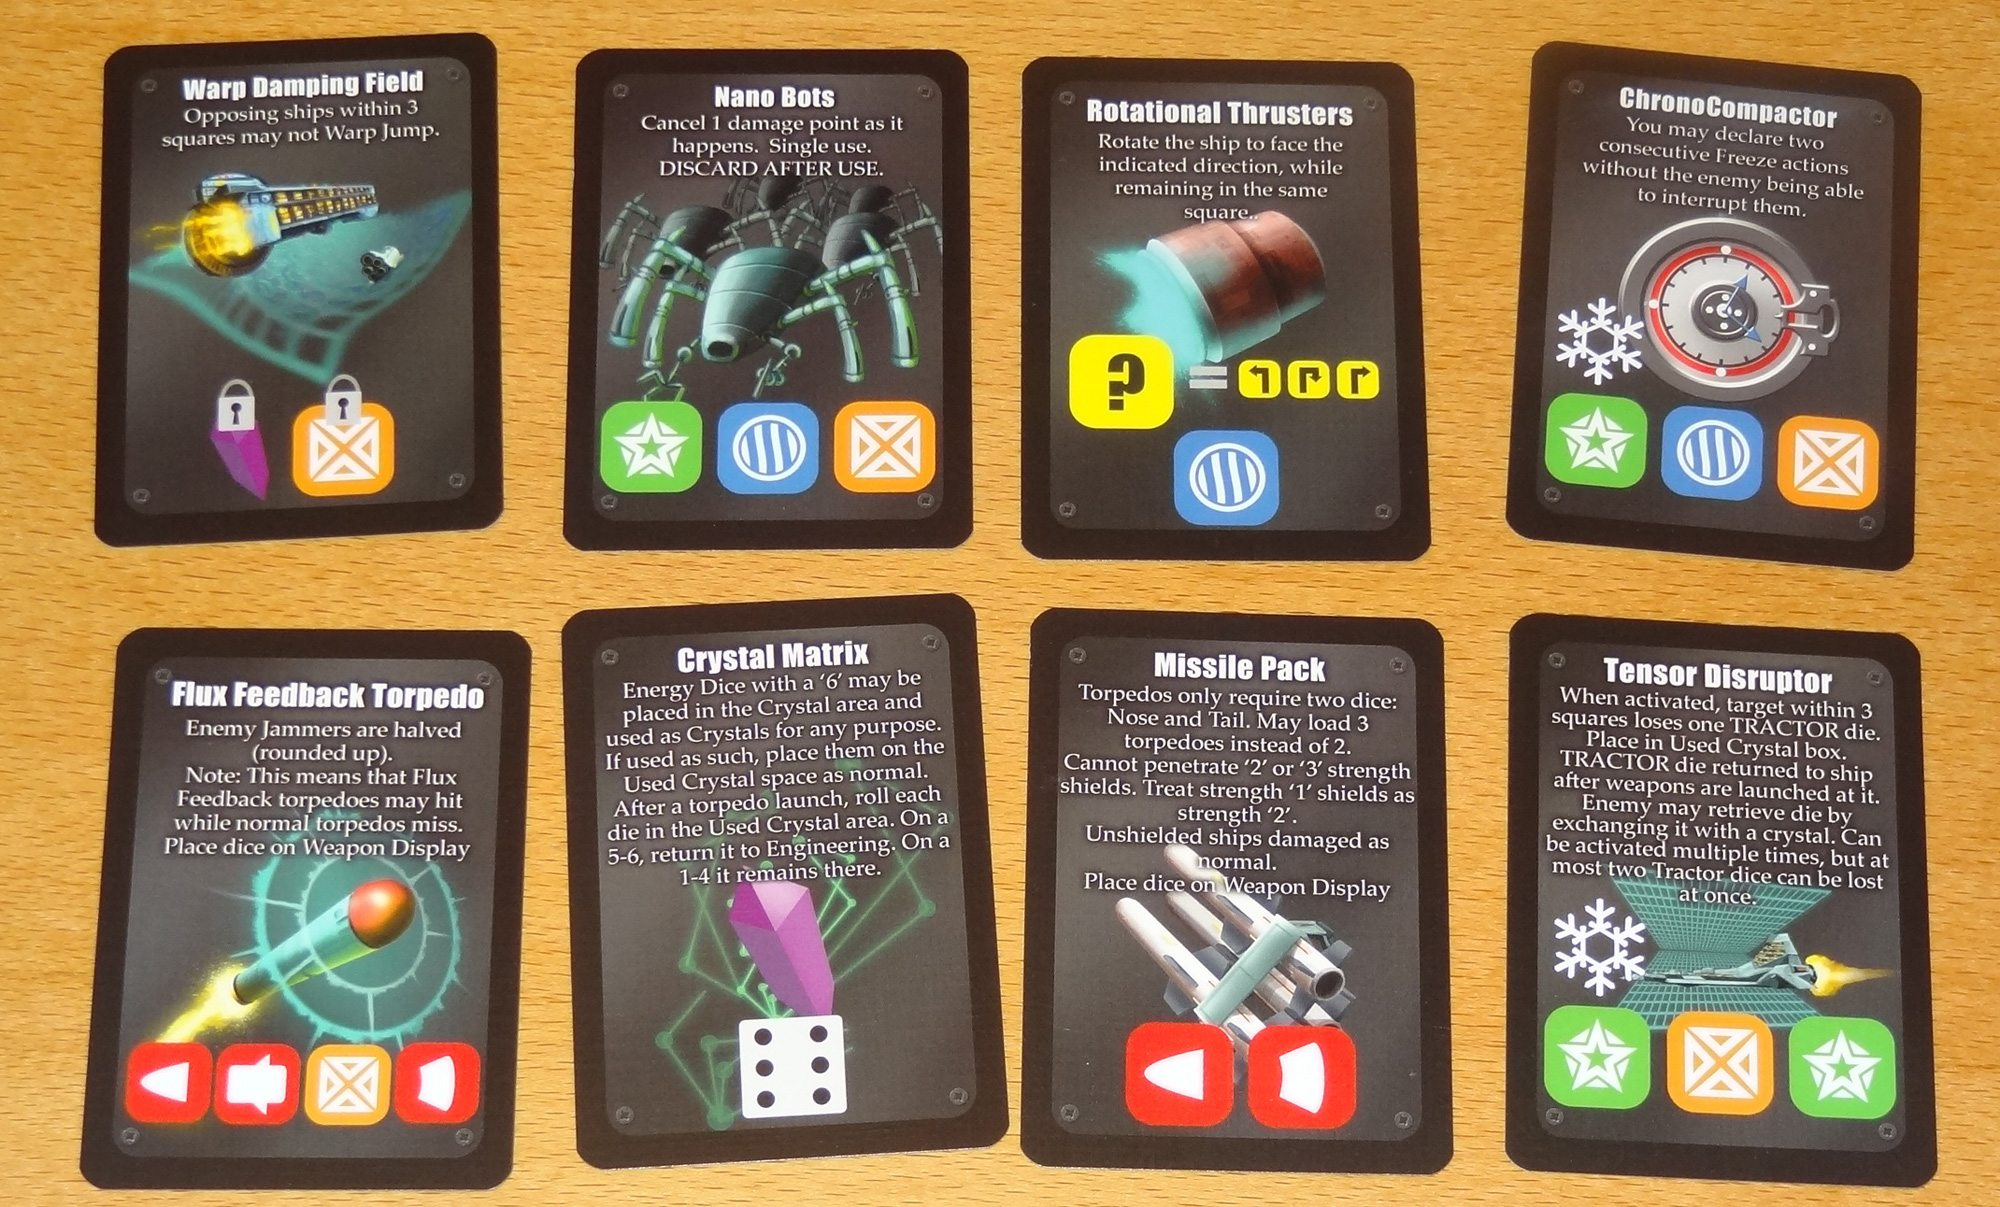 Die Fighter equipment cards